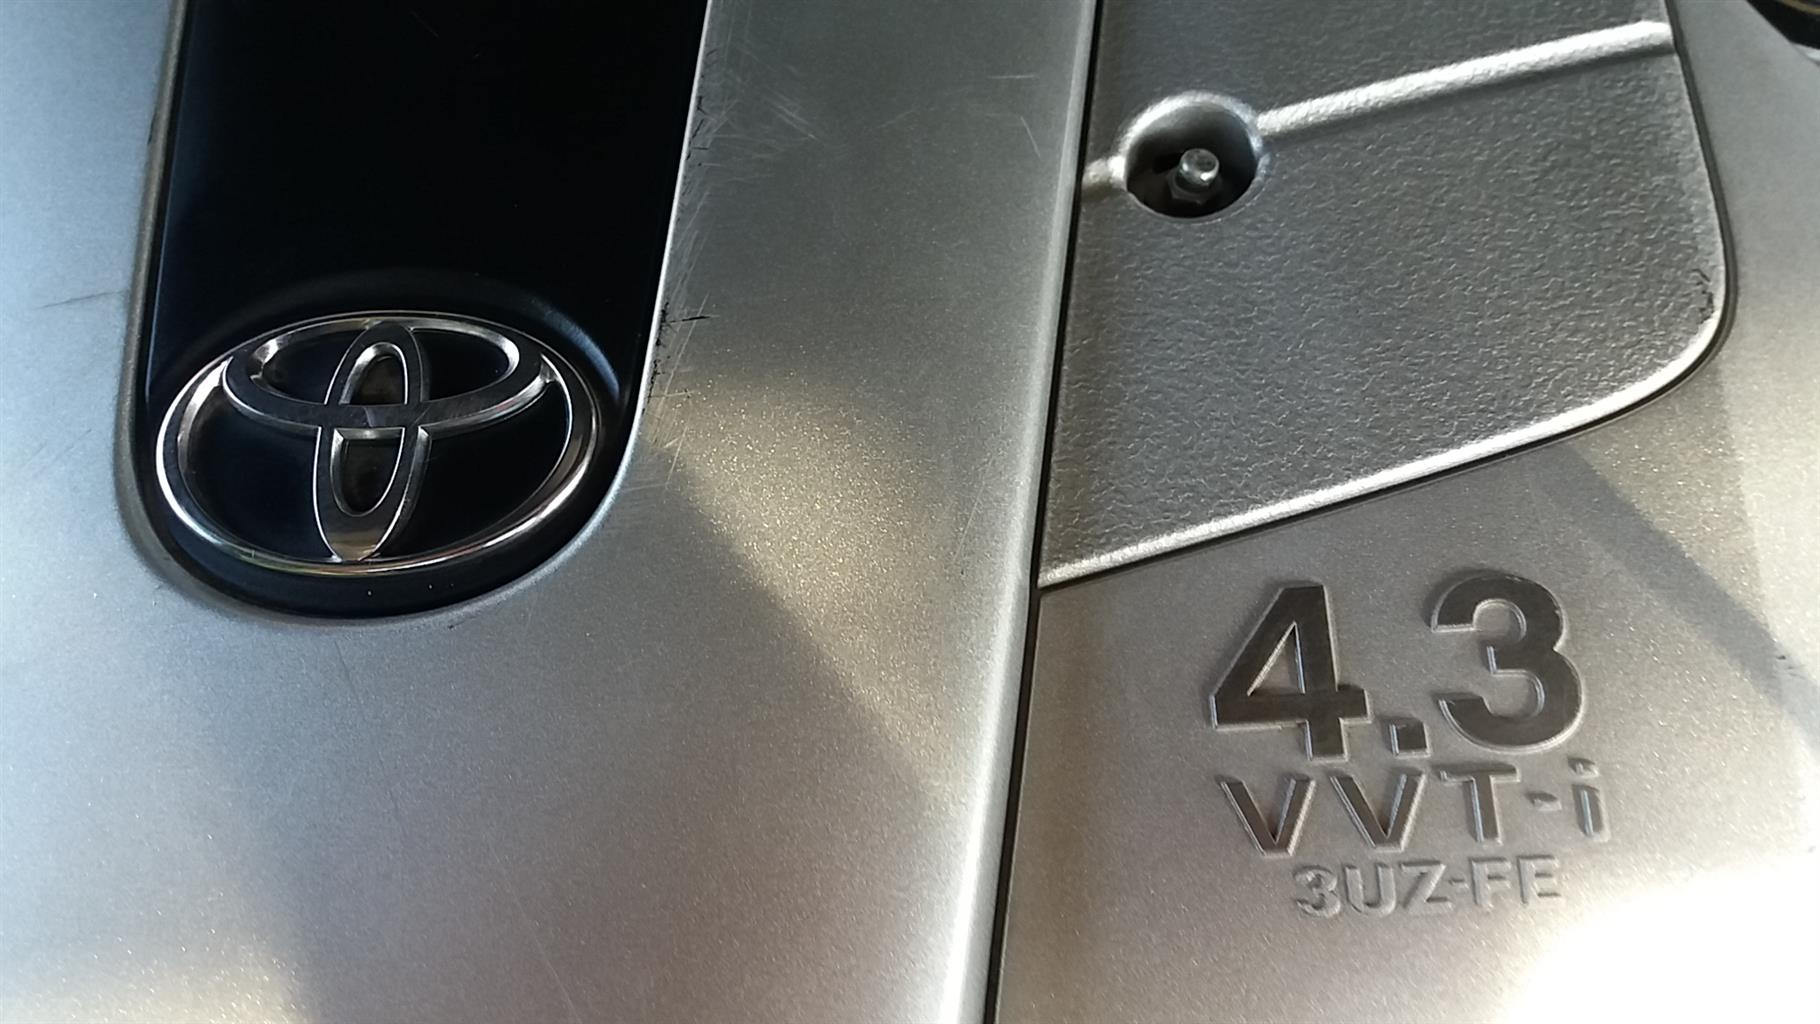 2008 Mazda BT-50 3000D double cab SLE 4x4